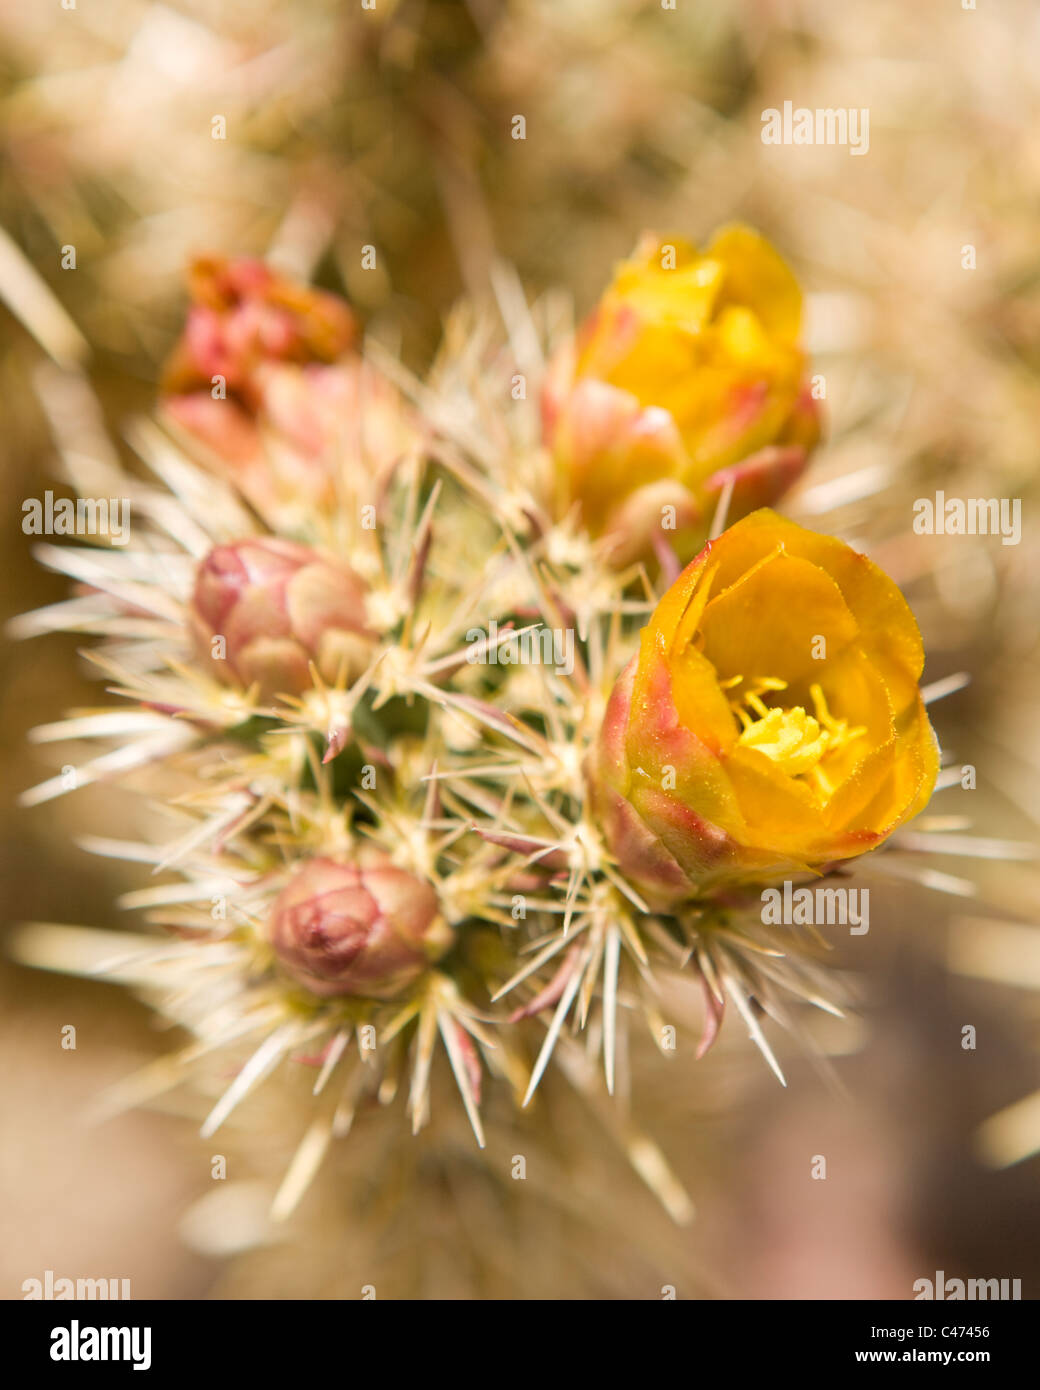 Cholla cactus in Bloom - Mojave, California USA Foto Stock